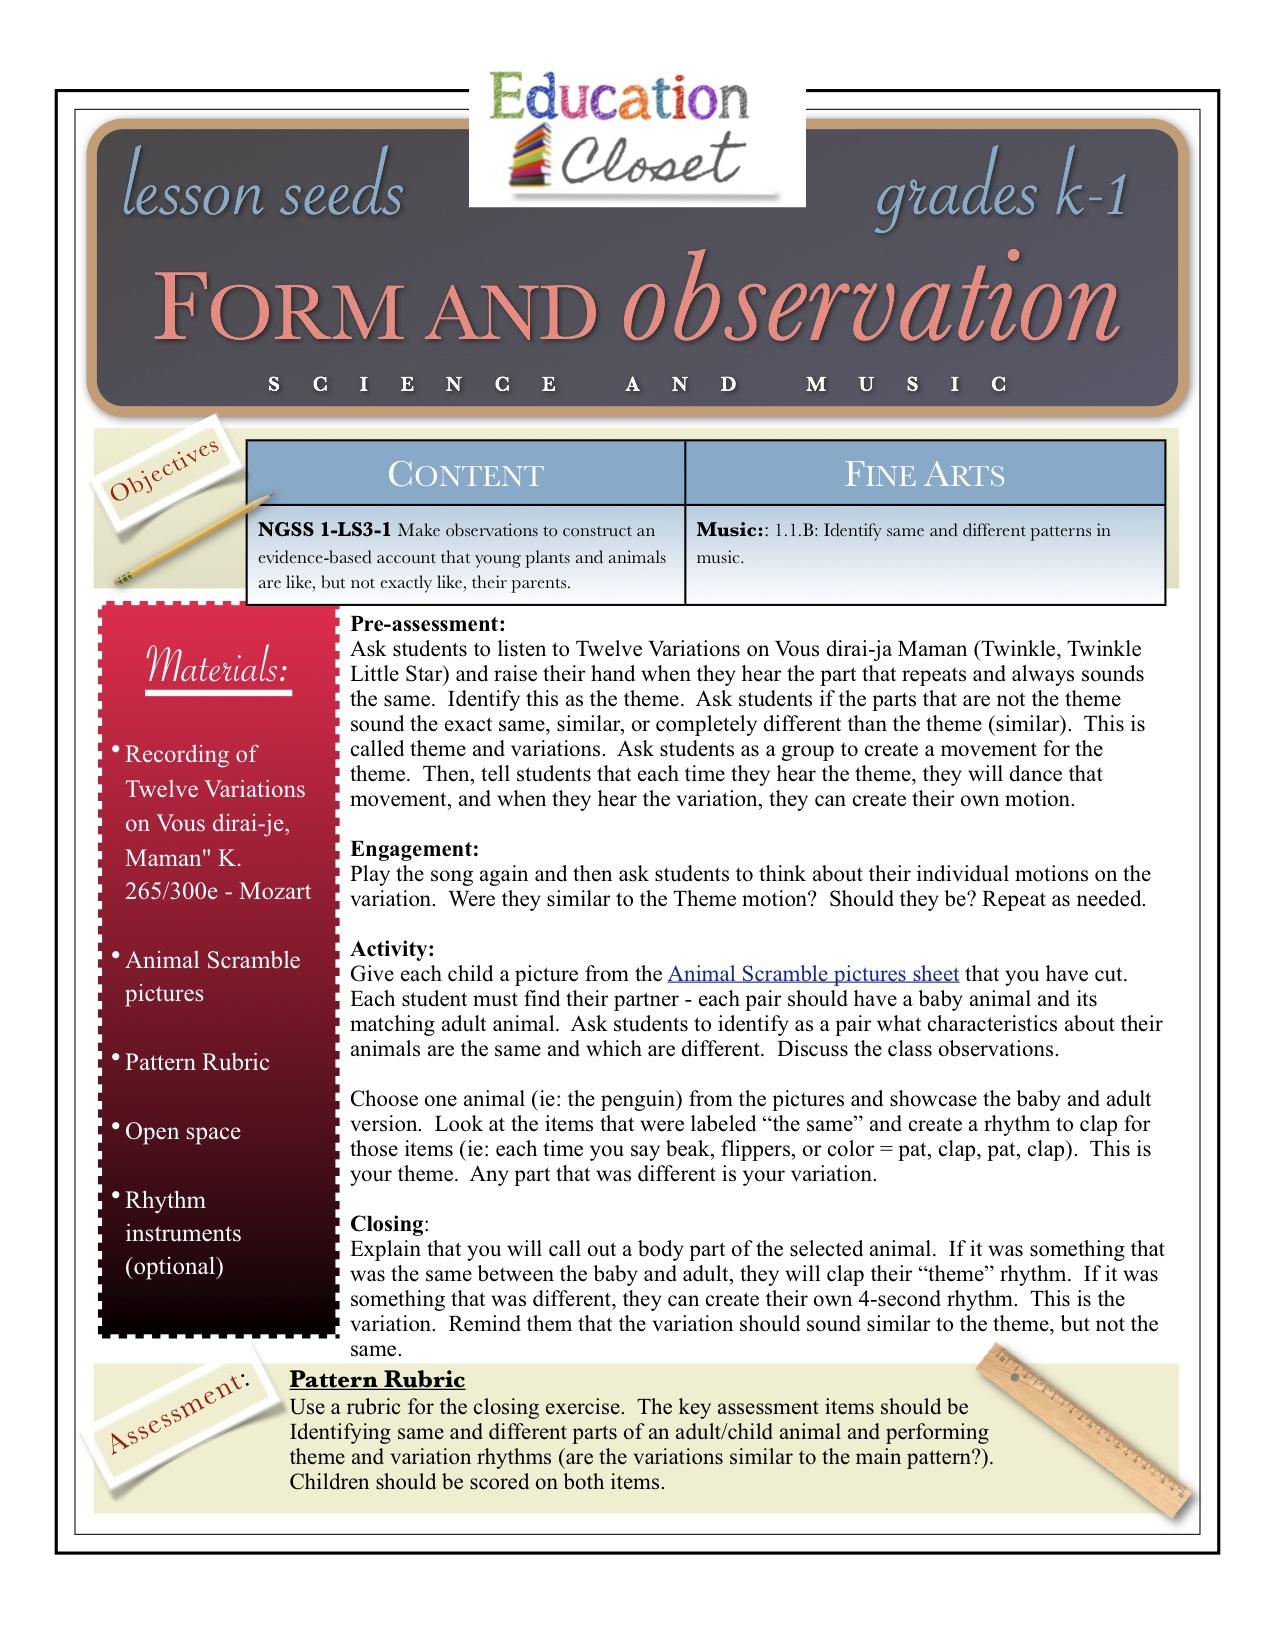 Form And Observation Arts Integration Lesson Education Closet